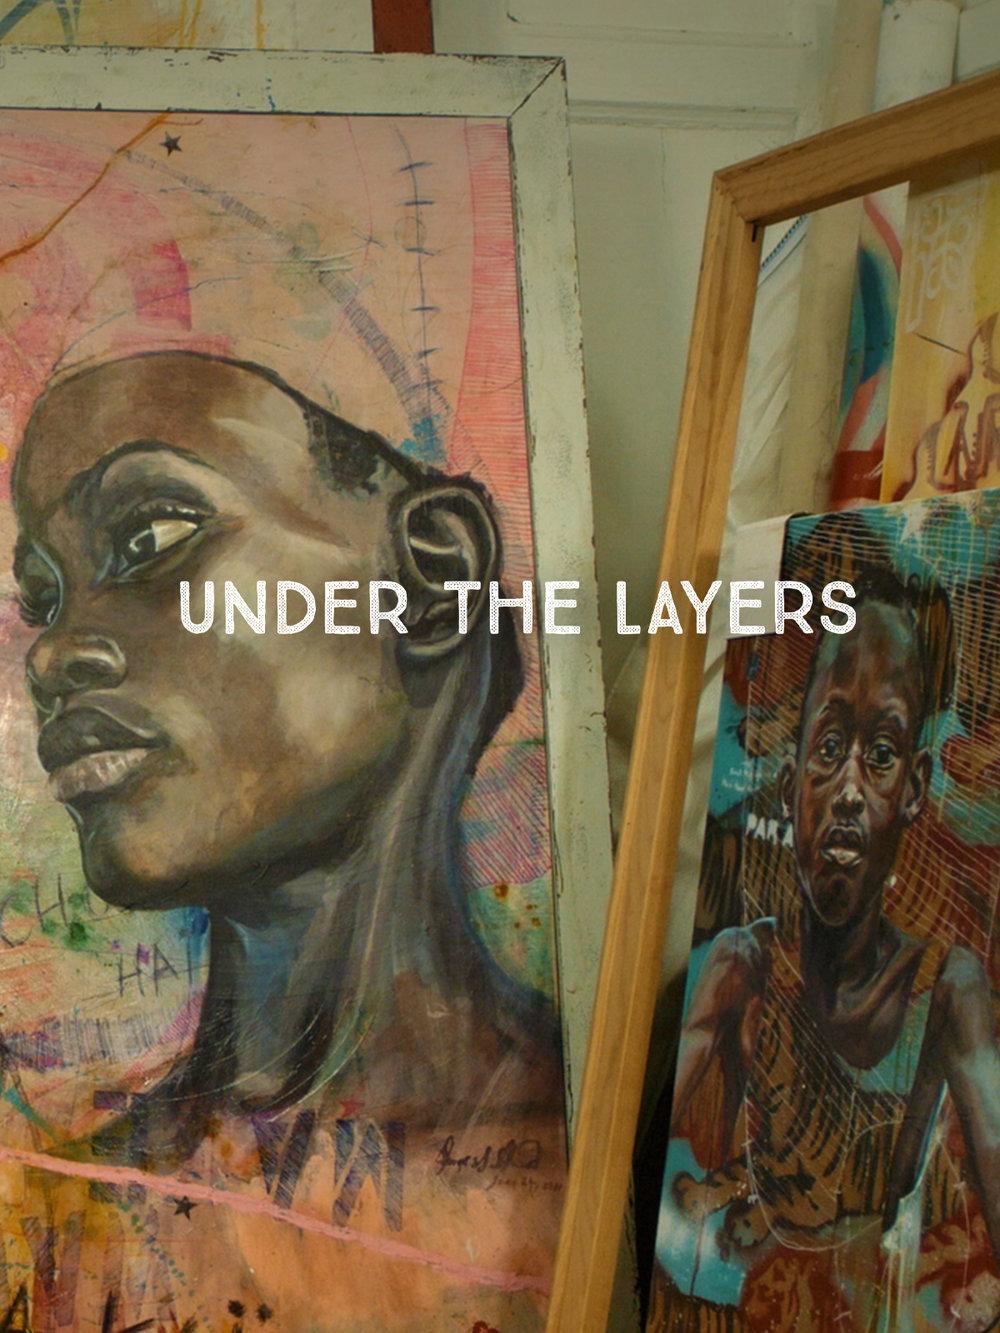 Under the Layers Director - Erik Montovano